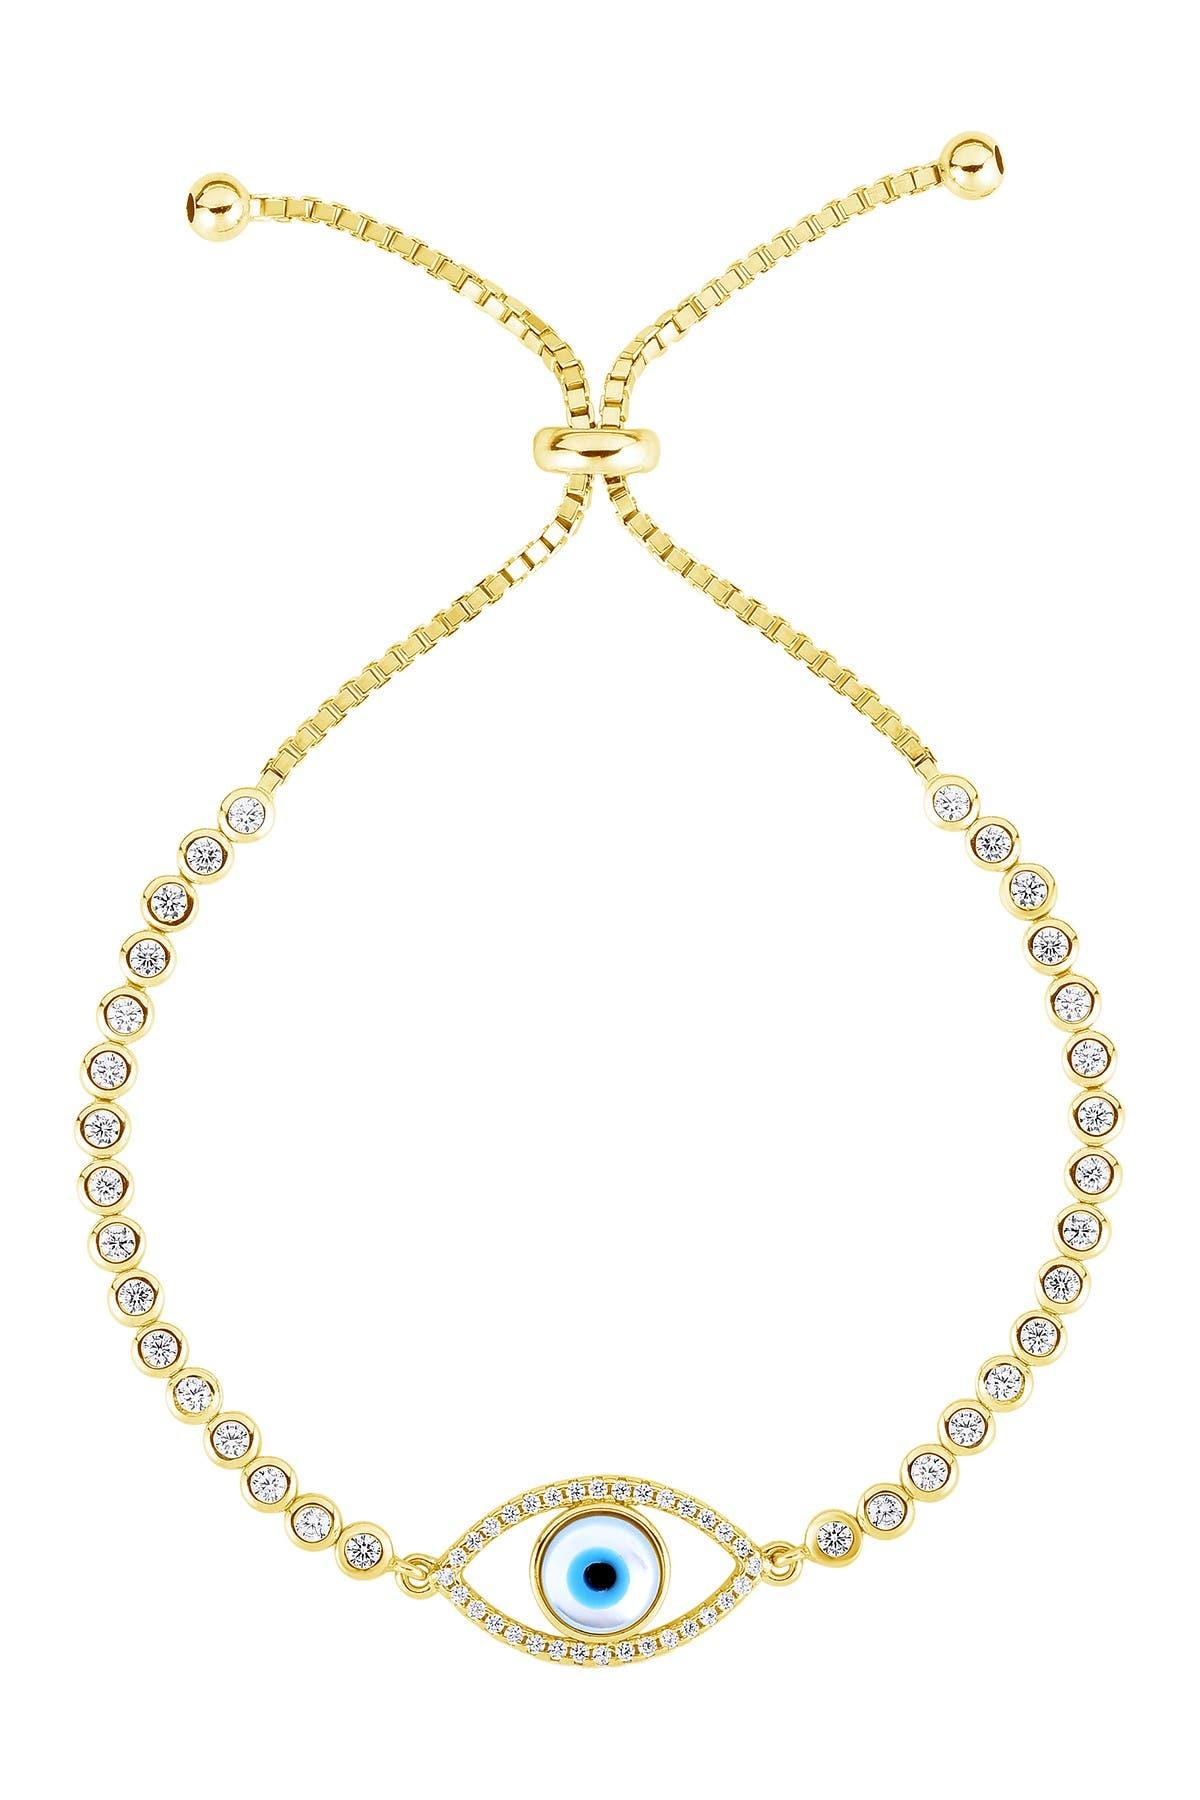 Sphera Milano 14K Yellow Gold Plated Sterling Silver Evil Eye Tennis Bracelet at Nordstrom Rack